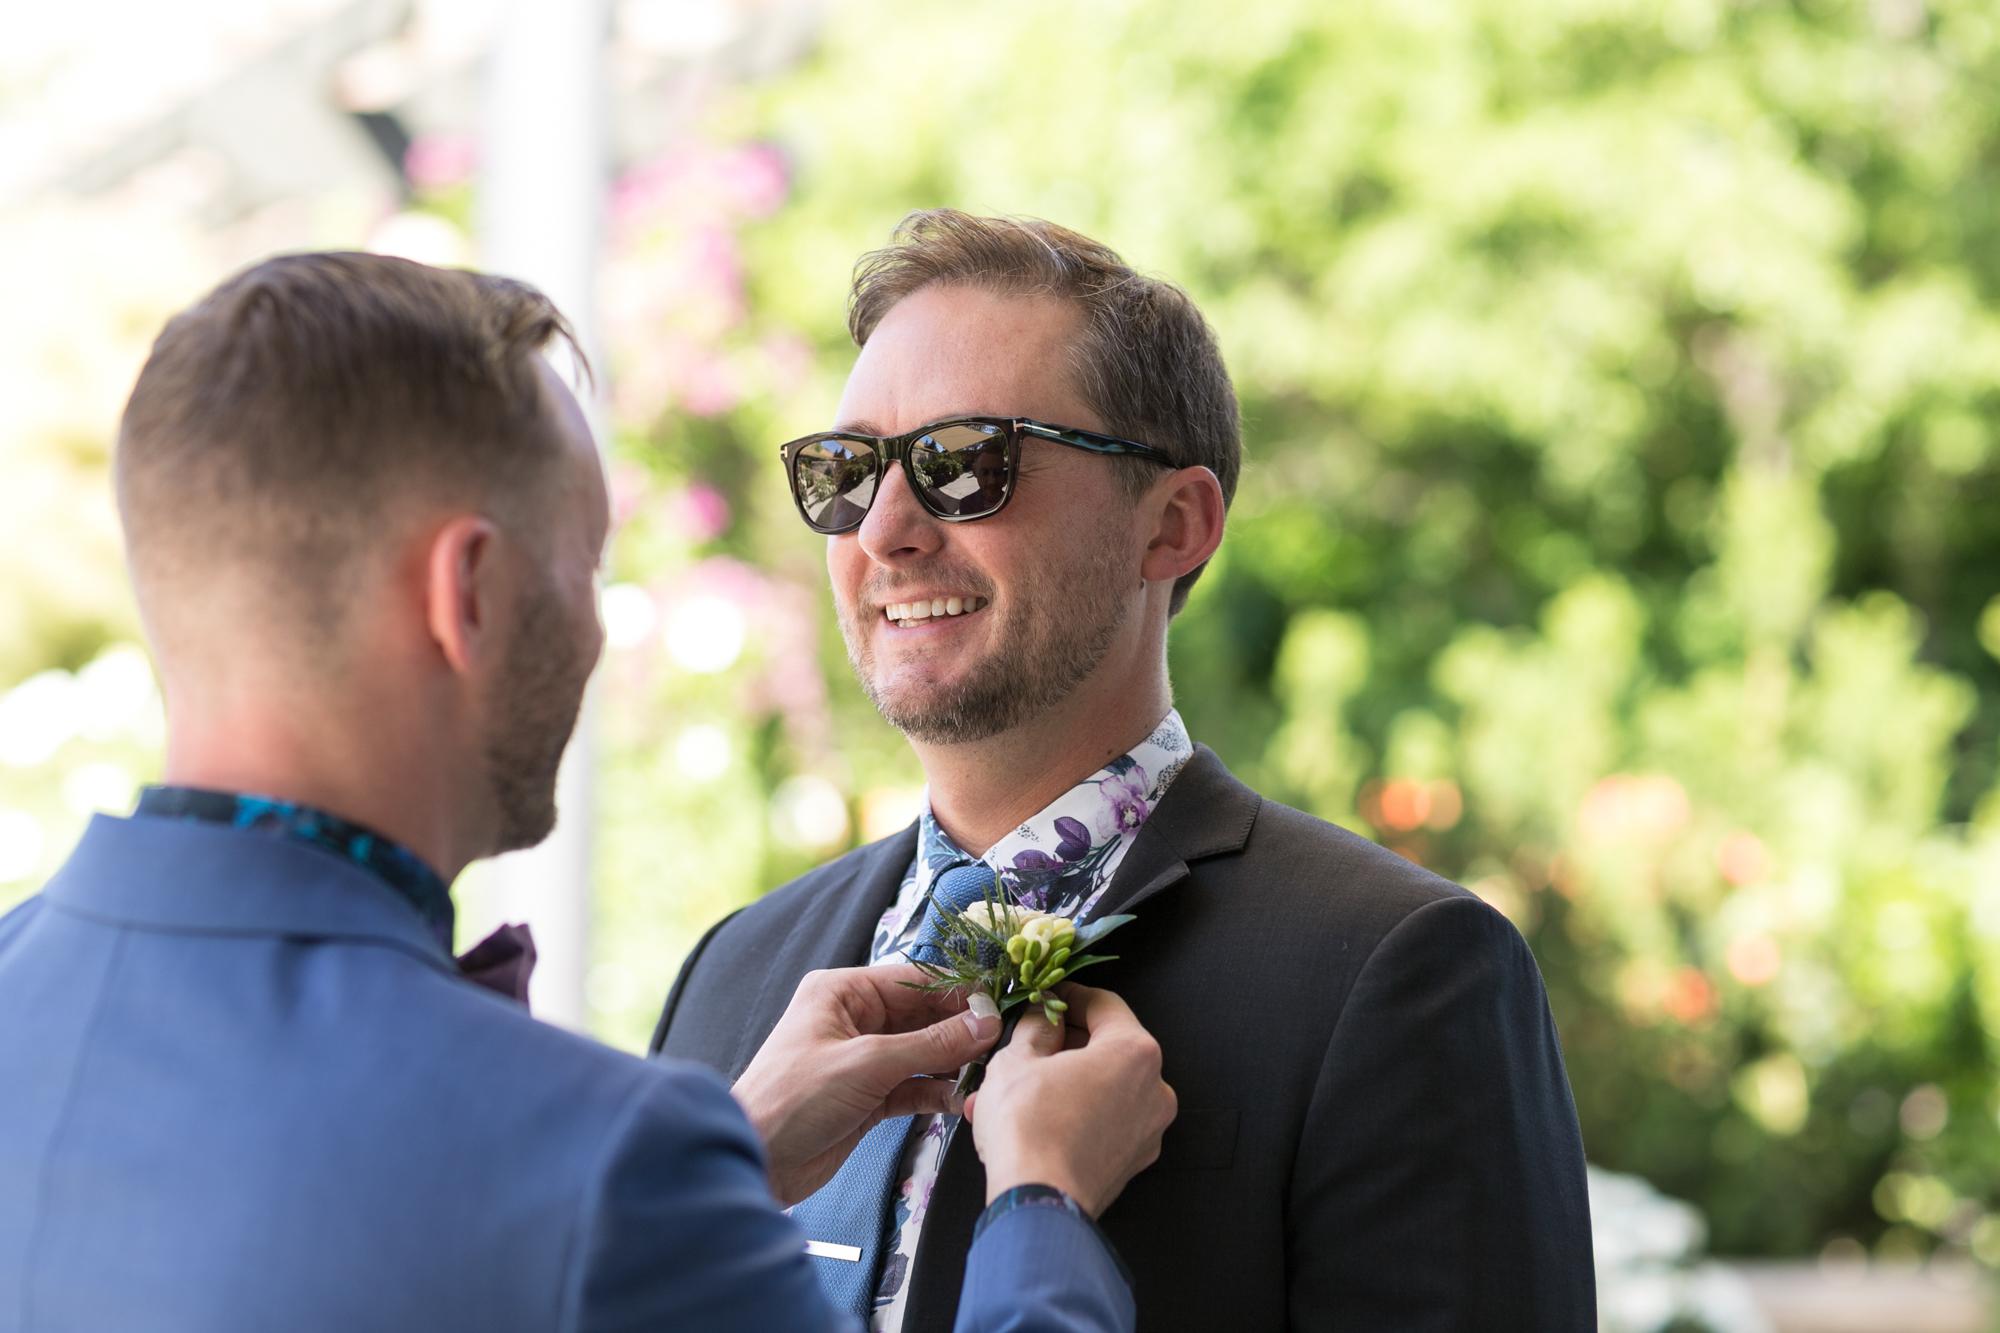 same-sex-wedding-red-butte-garden-5.jpg